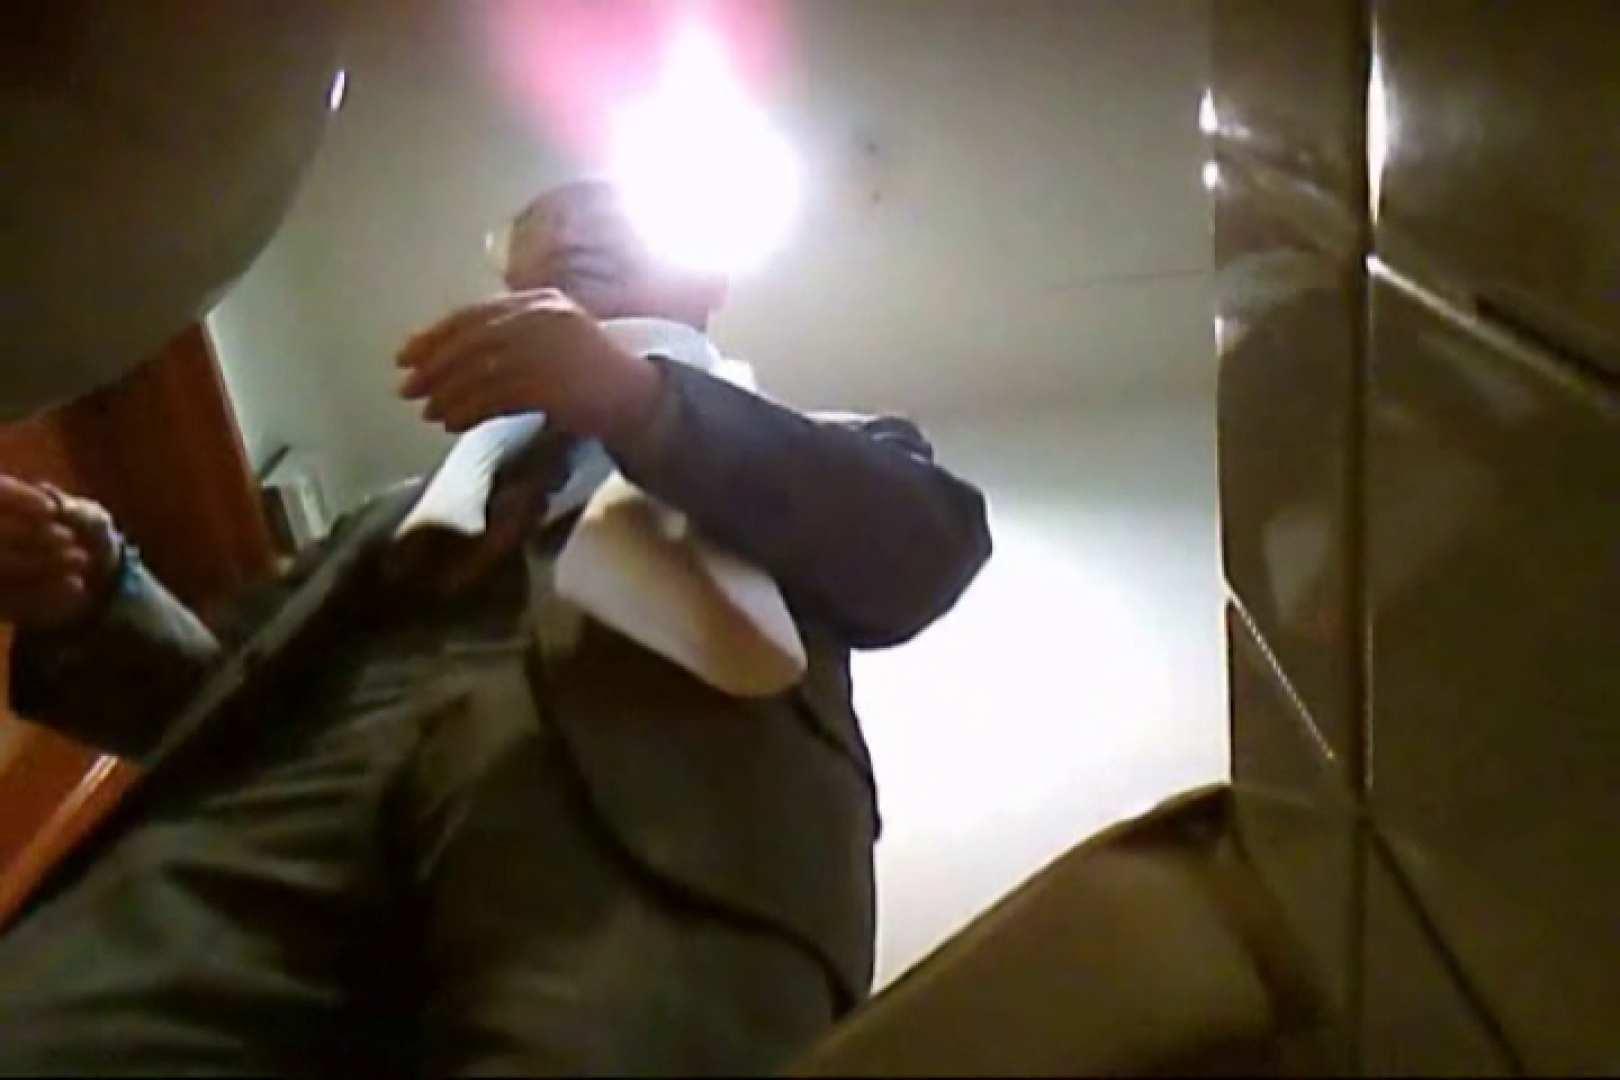 Gボーイ初投稿!掴み取りさんの洗面所覗き!in新幹線!VOL.16 リーマン系メンズ 尻マンコ画像 11画像 8